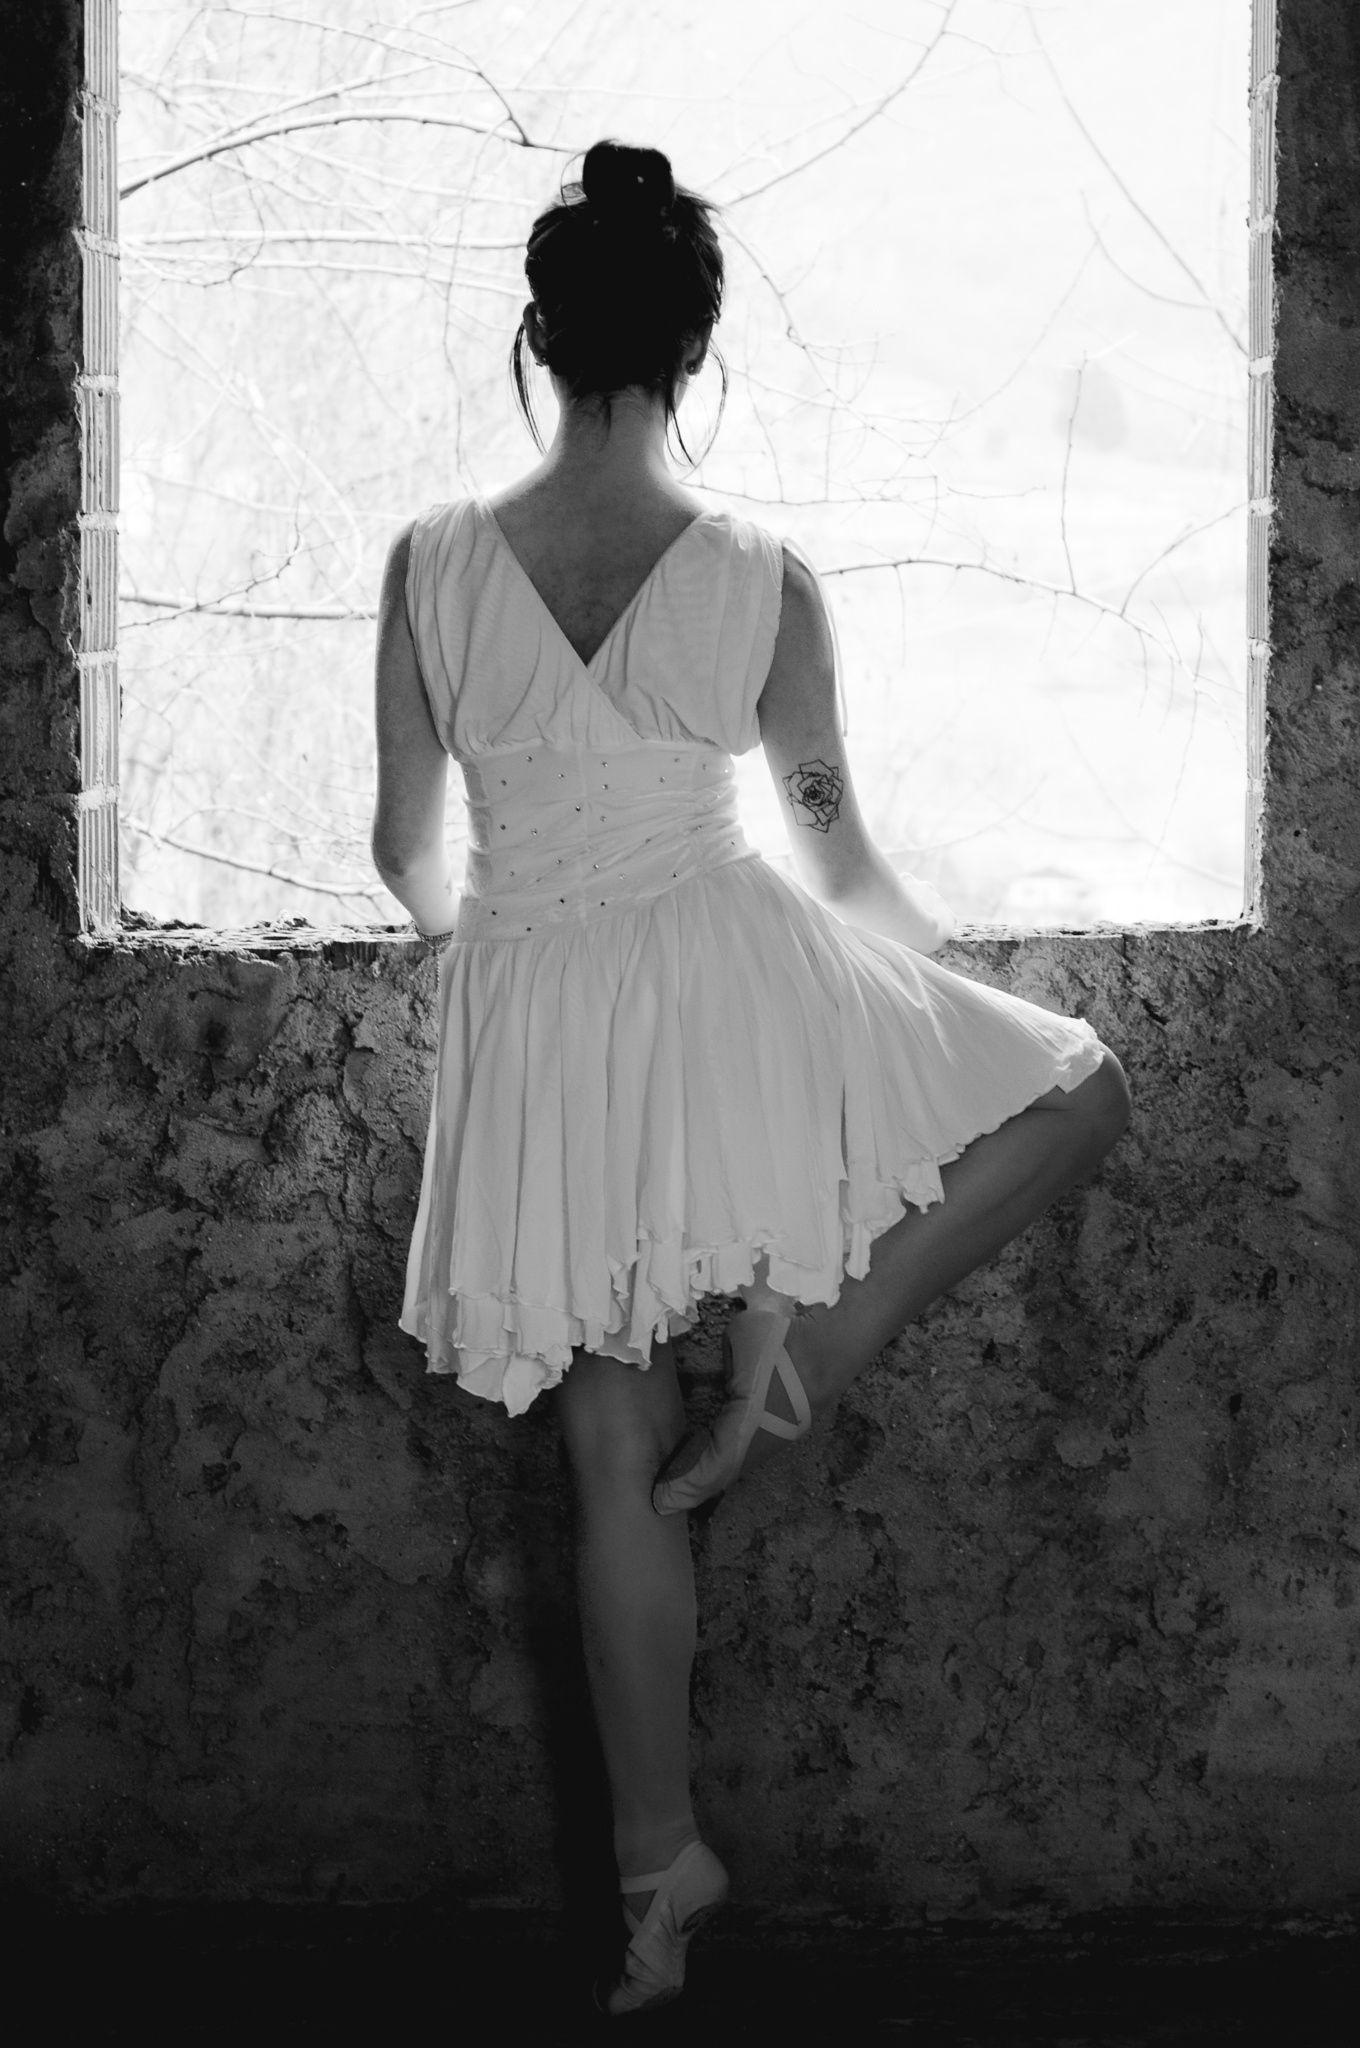 - Denise - - model: Denise Brazzale © Andrea Carollo 2016